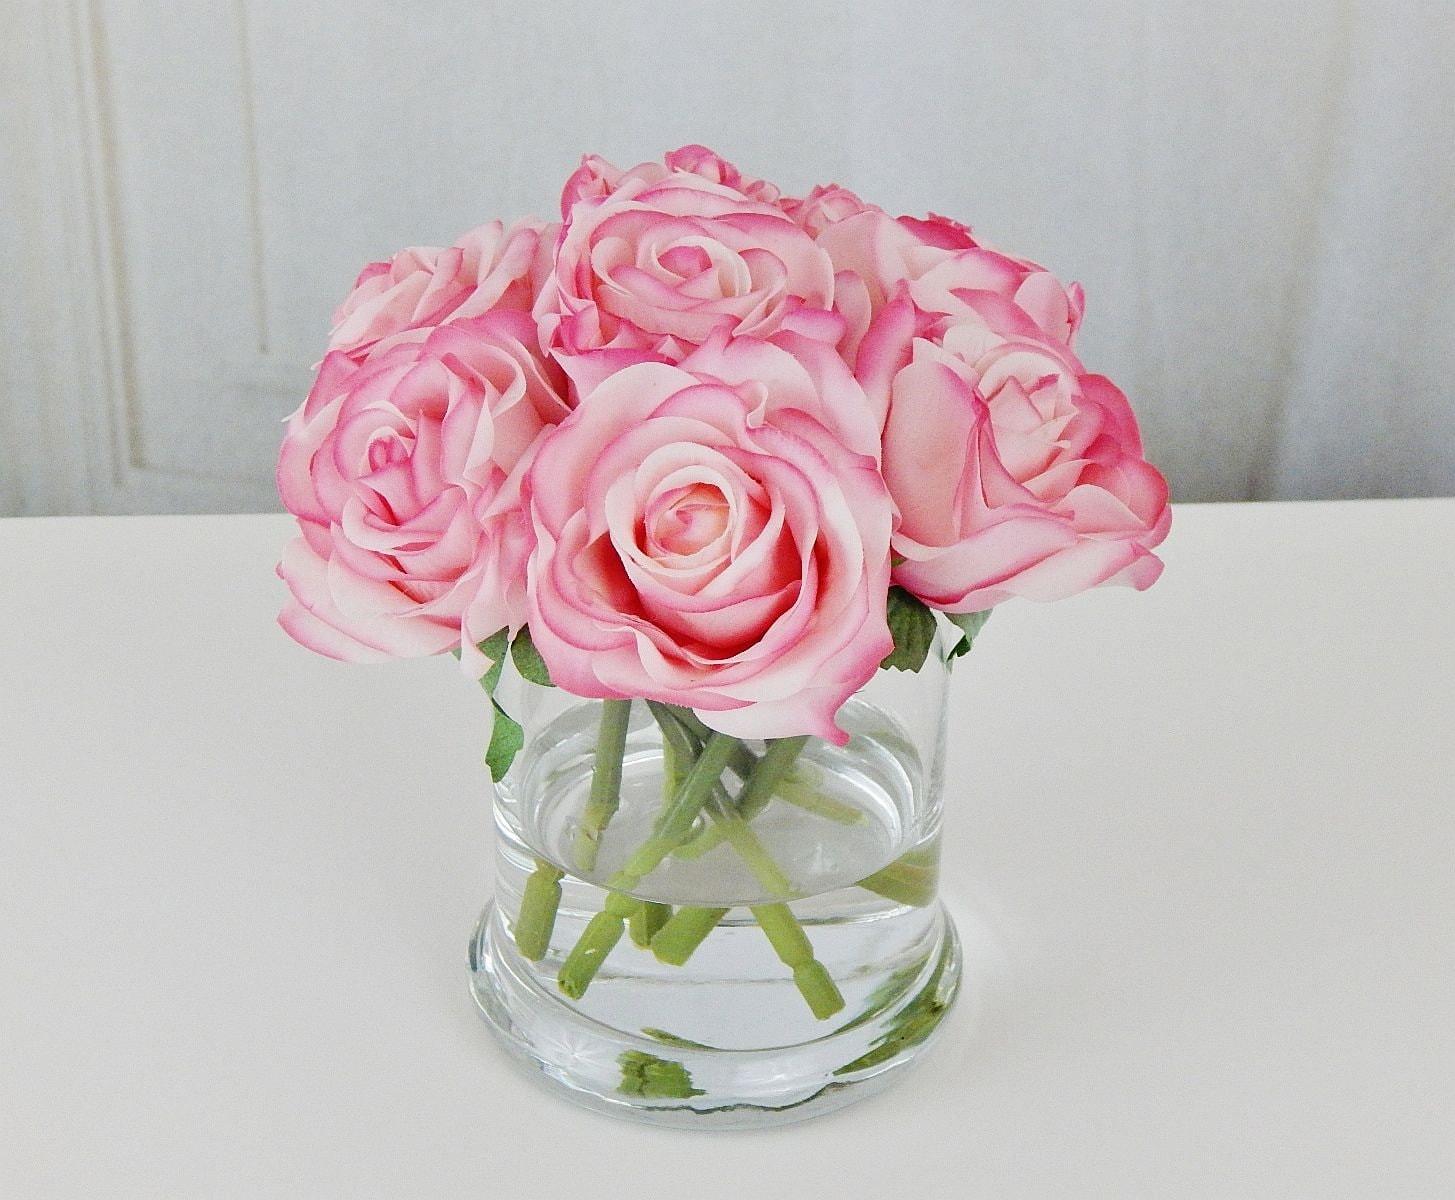 Pink blush roseroses glass vase faux water acrylicillusion pink blush roseroses glass vase faux water acrylicillusion silk real touch flowers floral arrangement centerpiece decor gift mightylinksfo